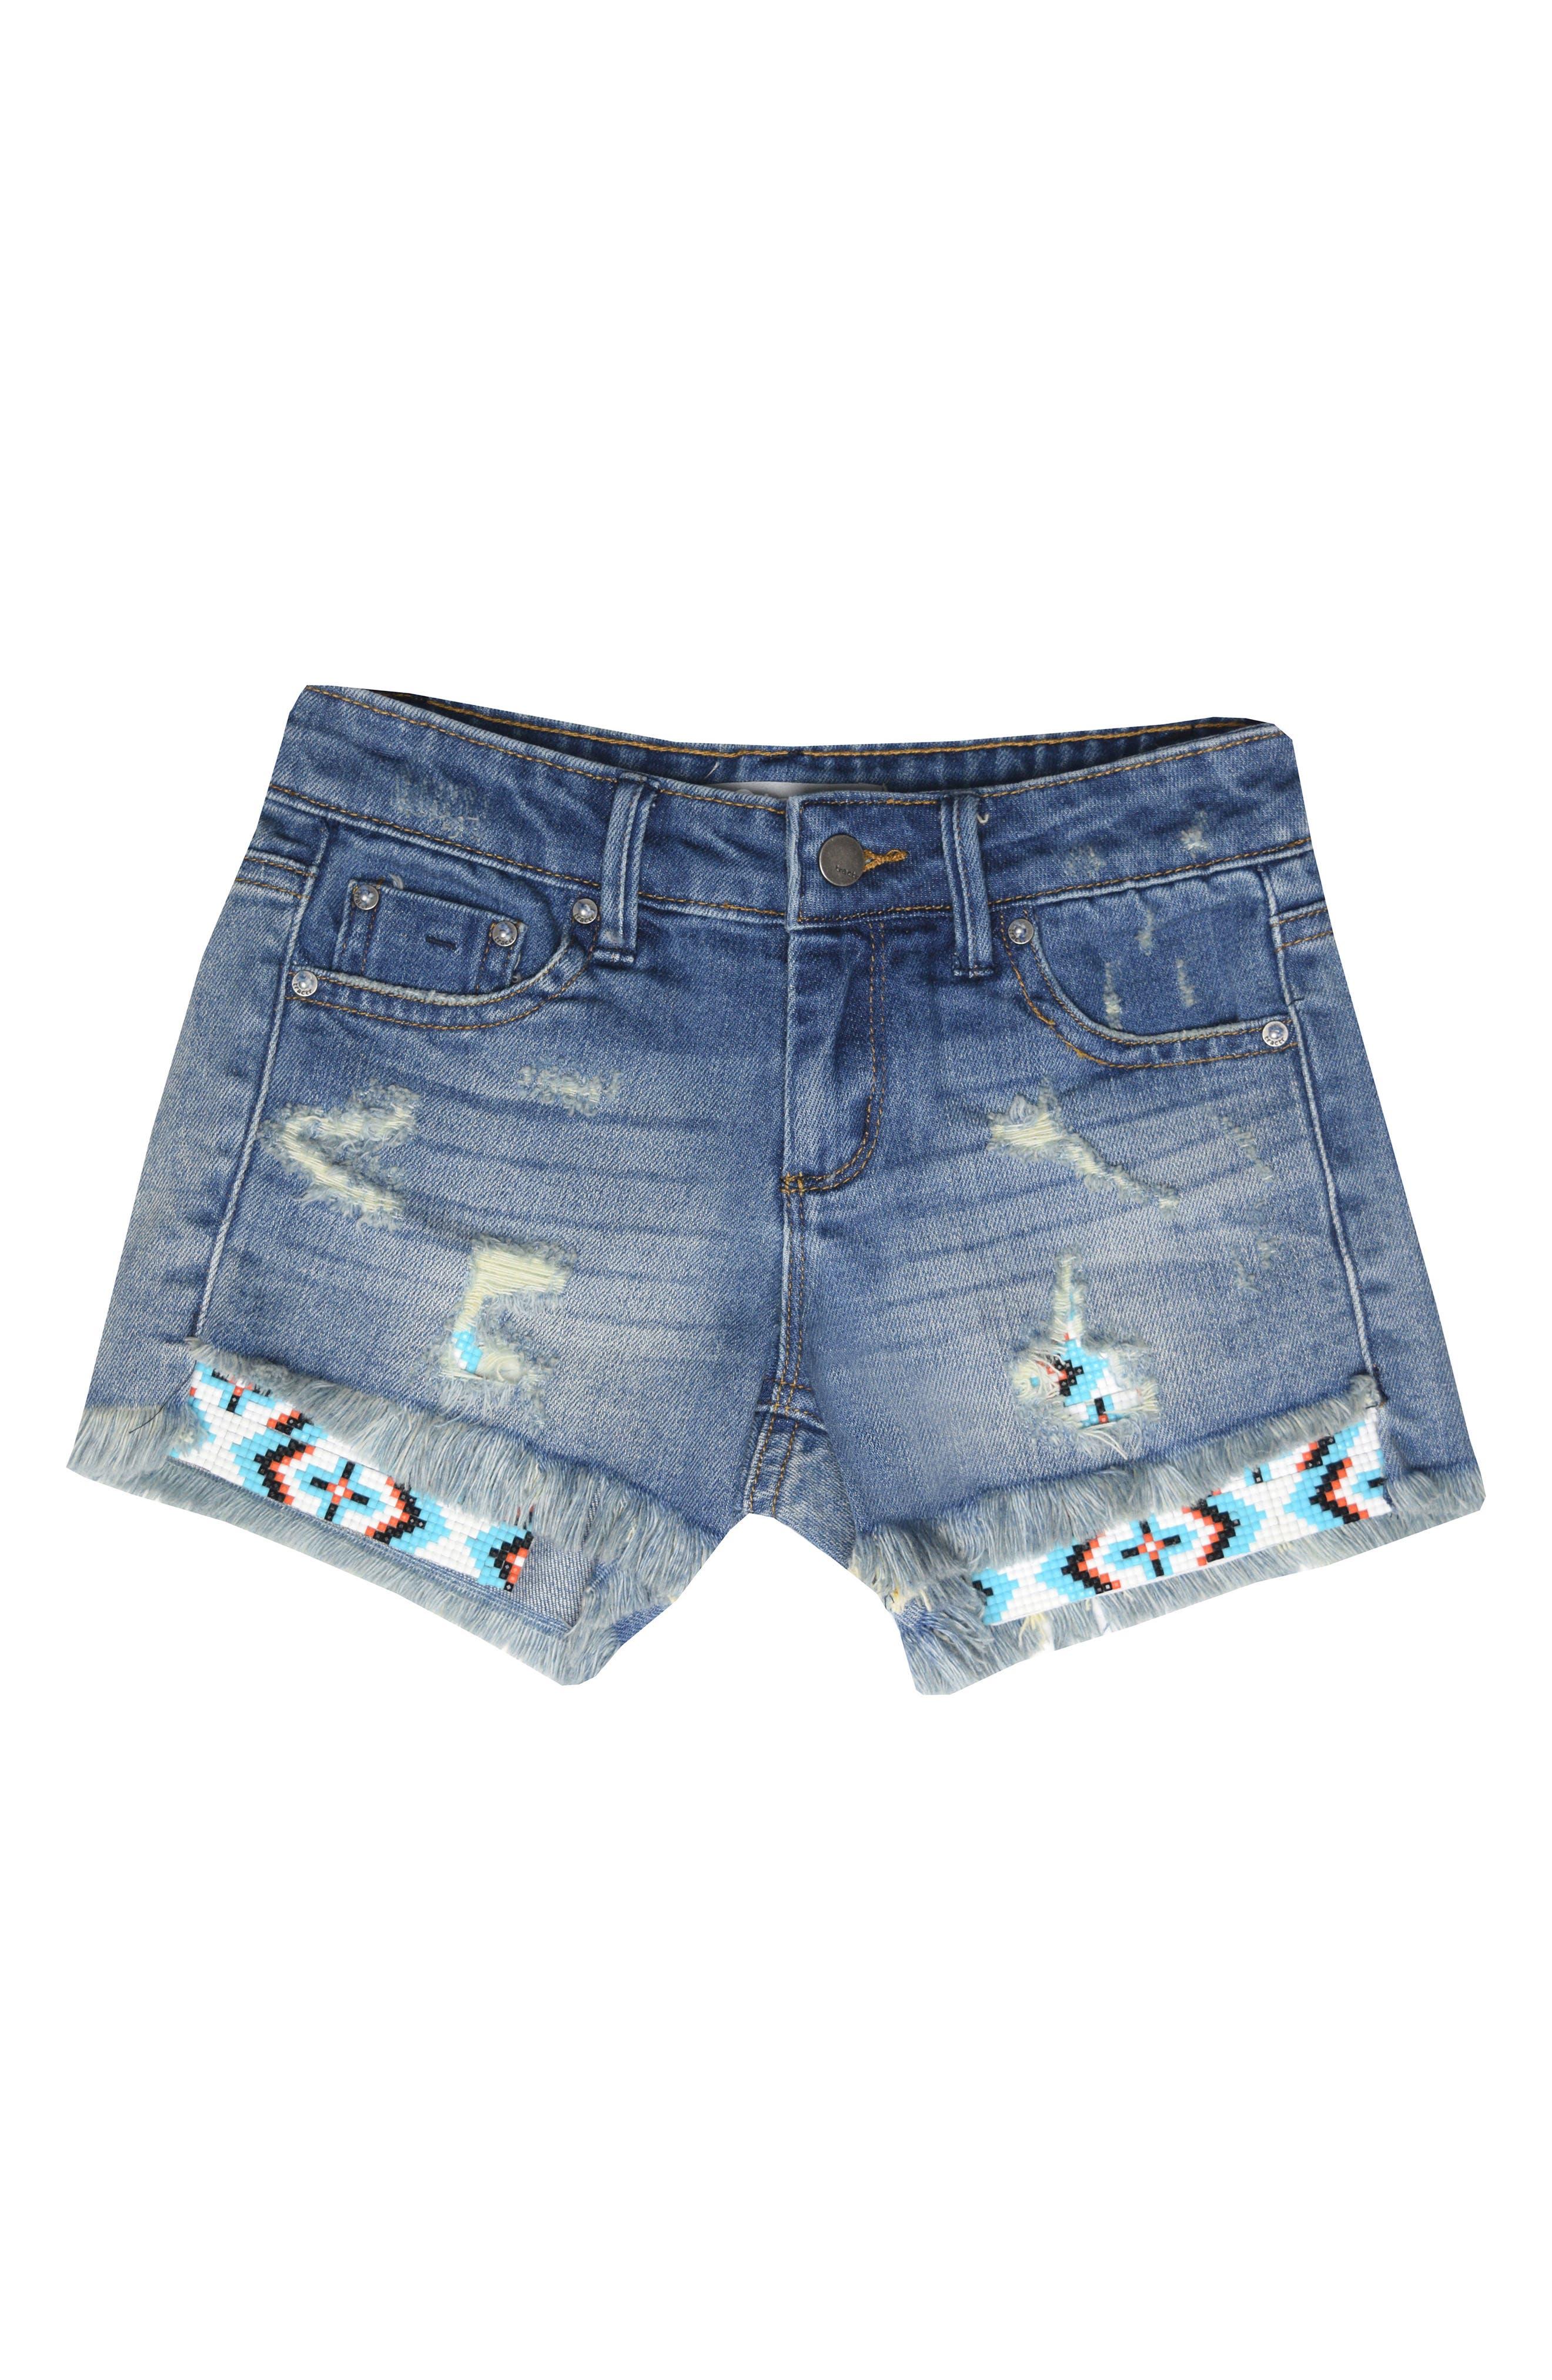 Beaded Distressed Denim Shorts,                             Main thumbnail 1, color,                             409